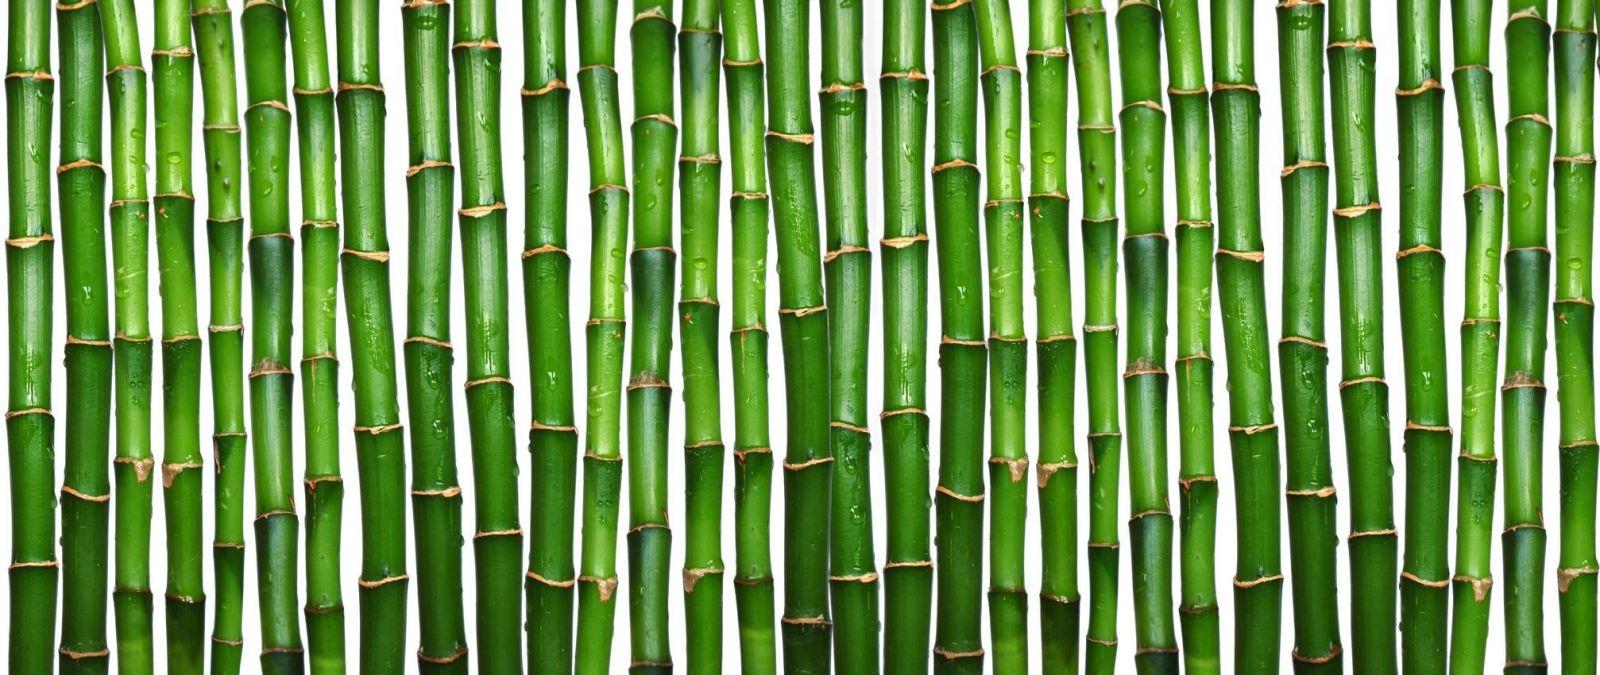 Bamboo blinds 1